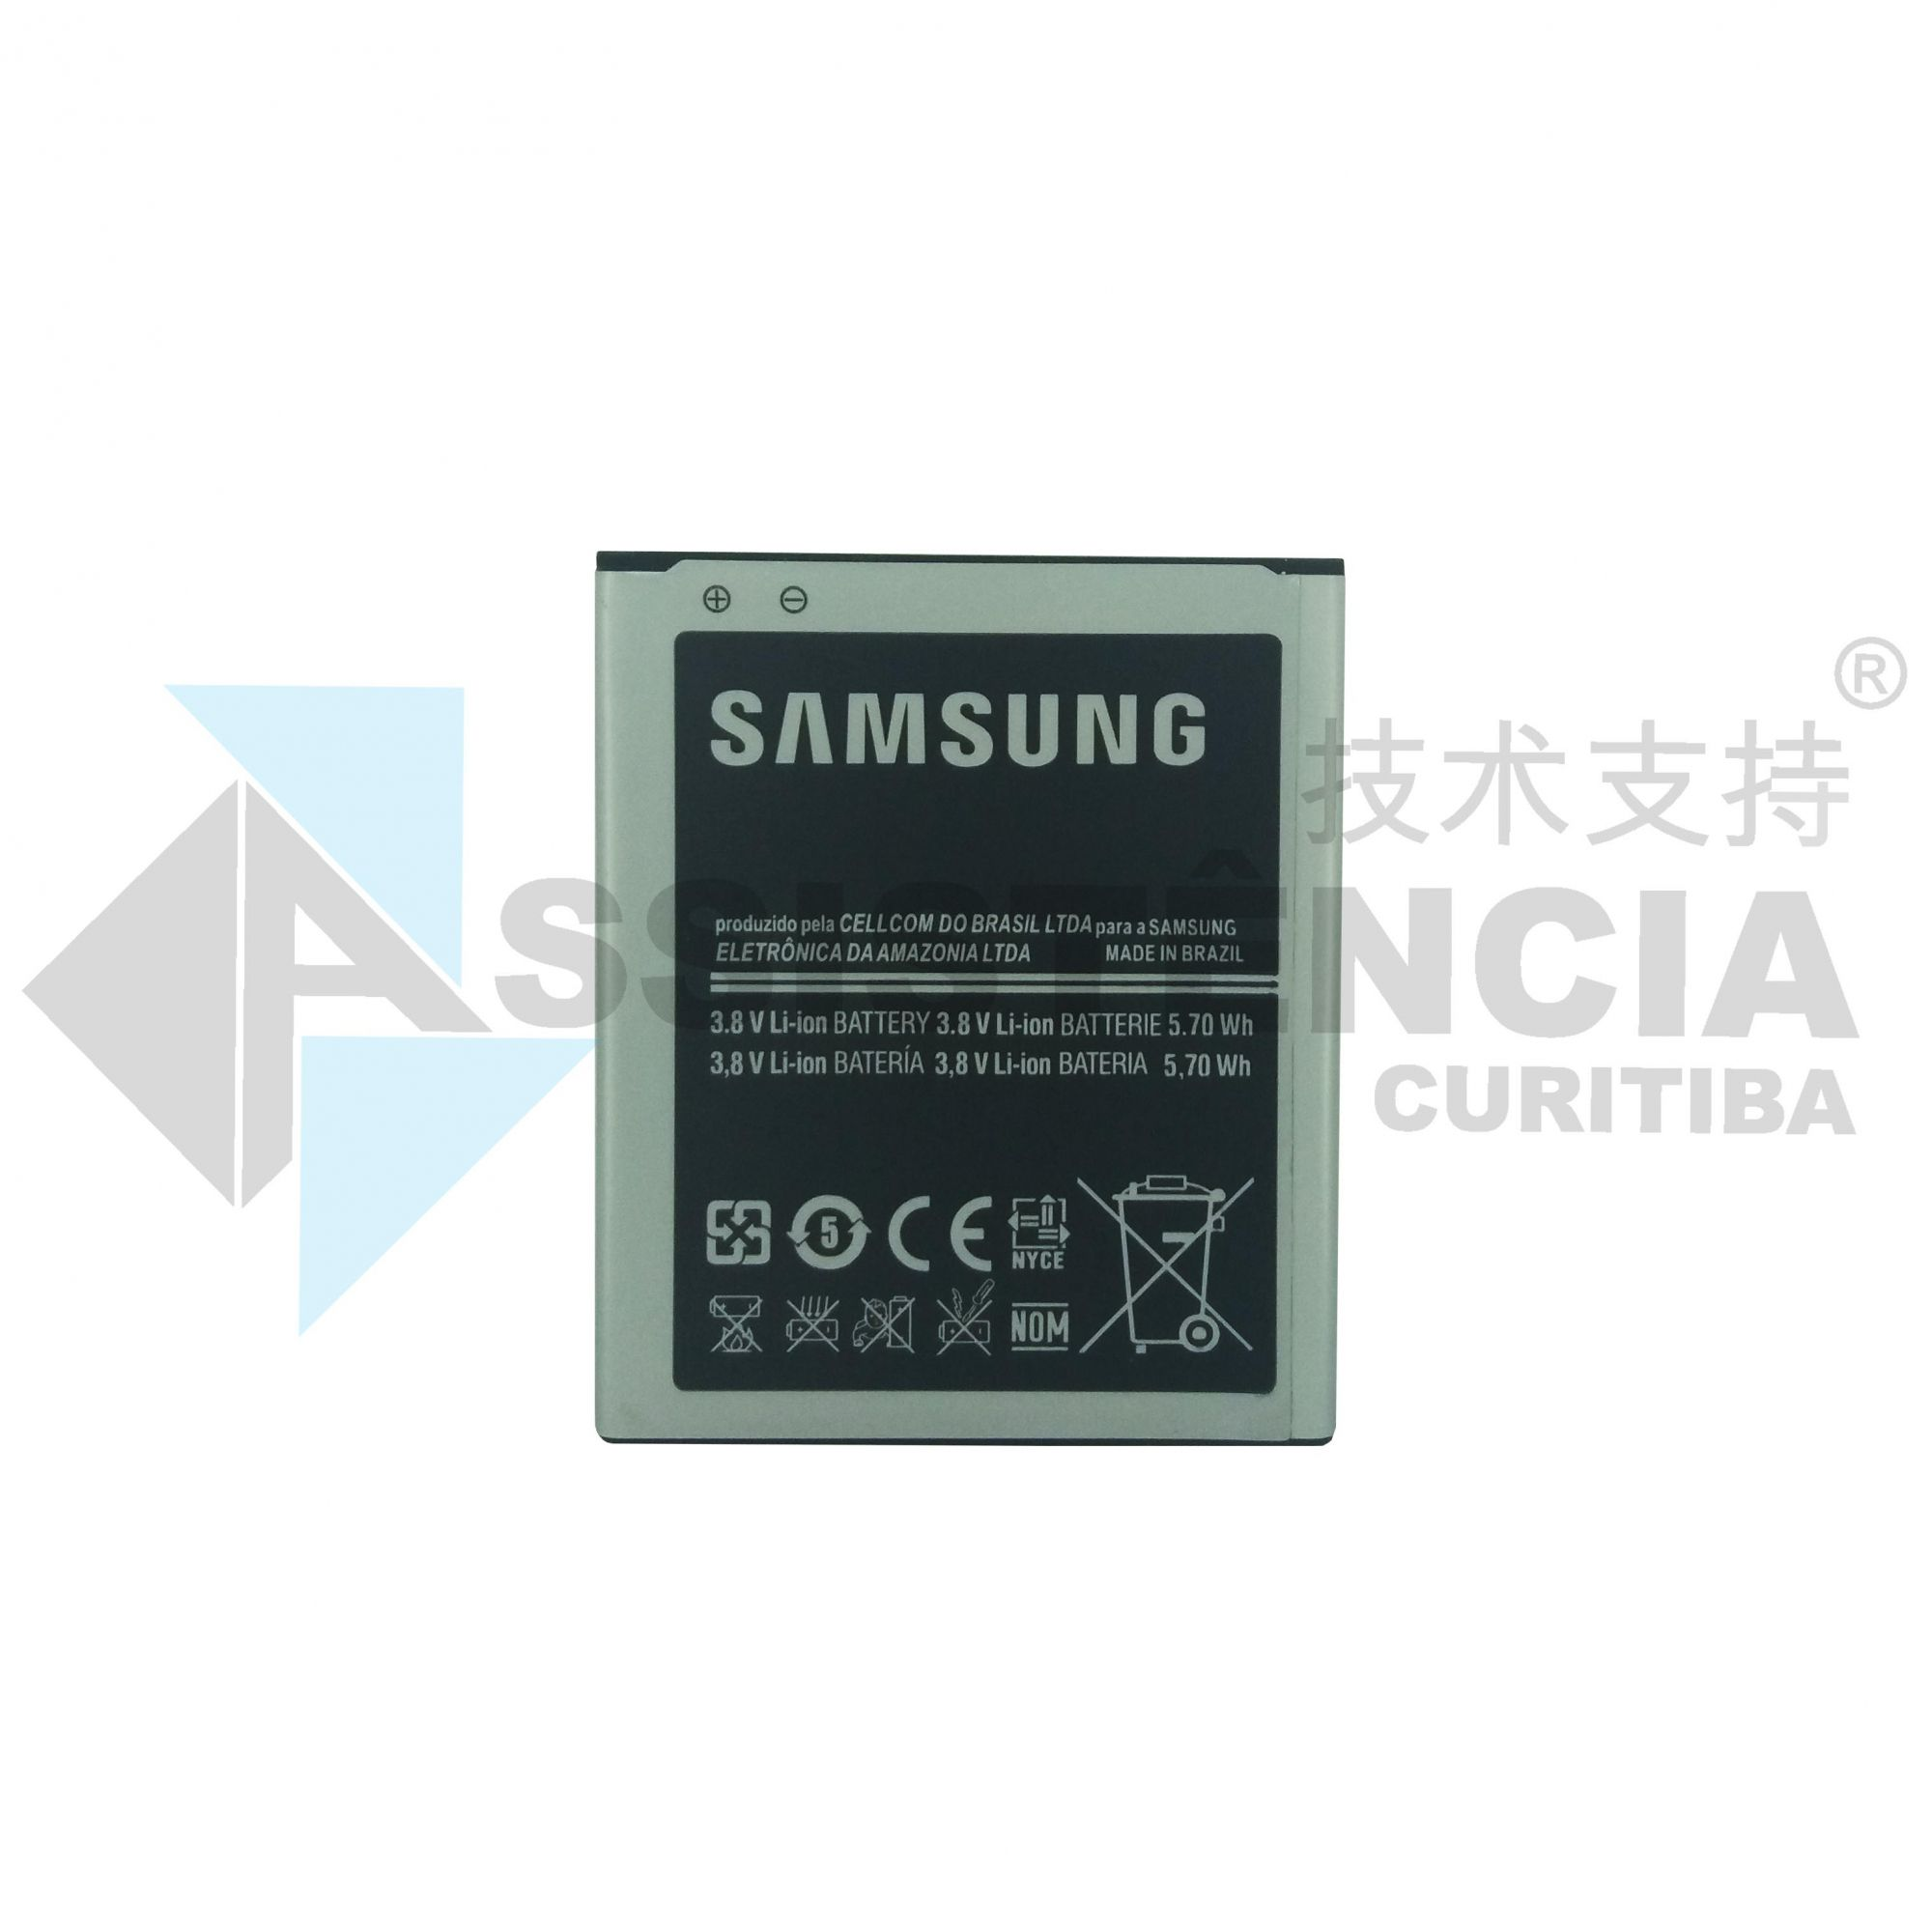 Bateria Samsung Galaxy S2 Tv 7273M Modelo B100Ae